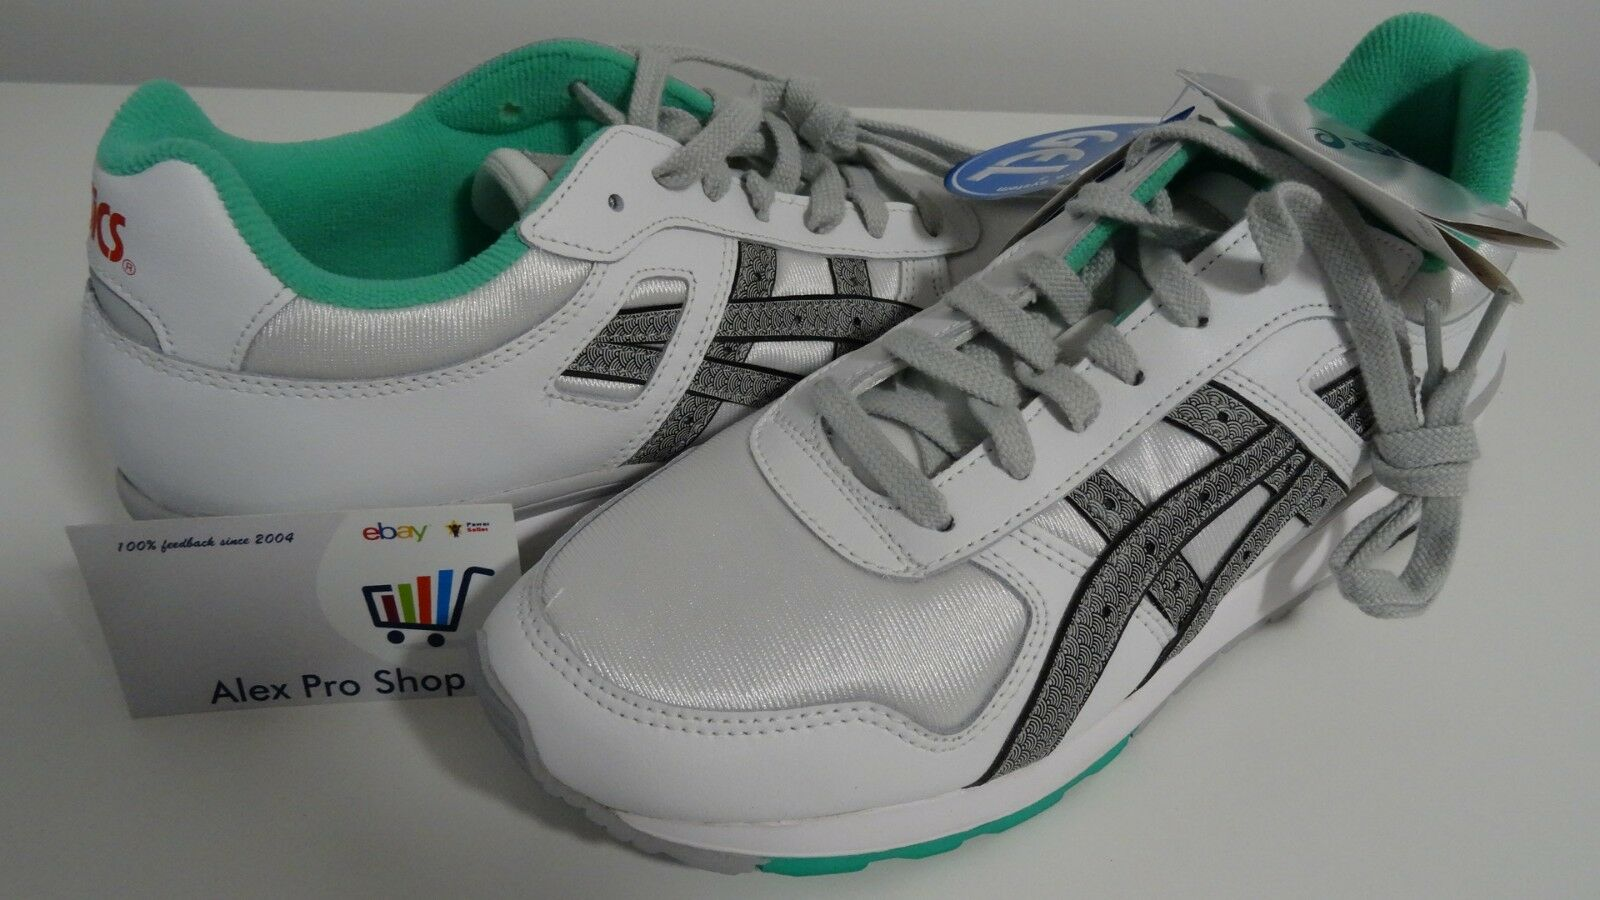 New Men's Size 10 Asics GT-II White Soft Grey H407N